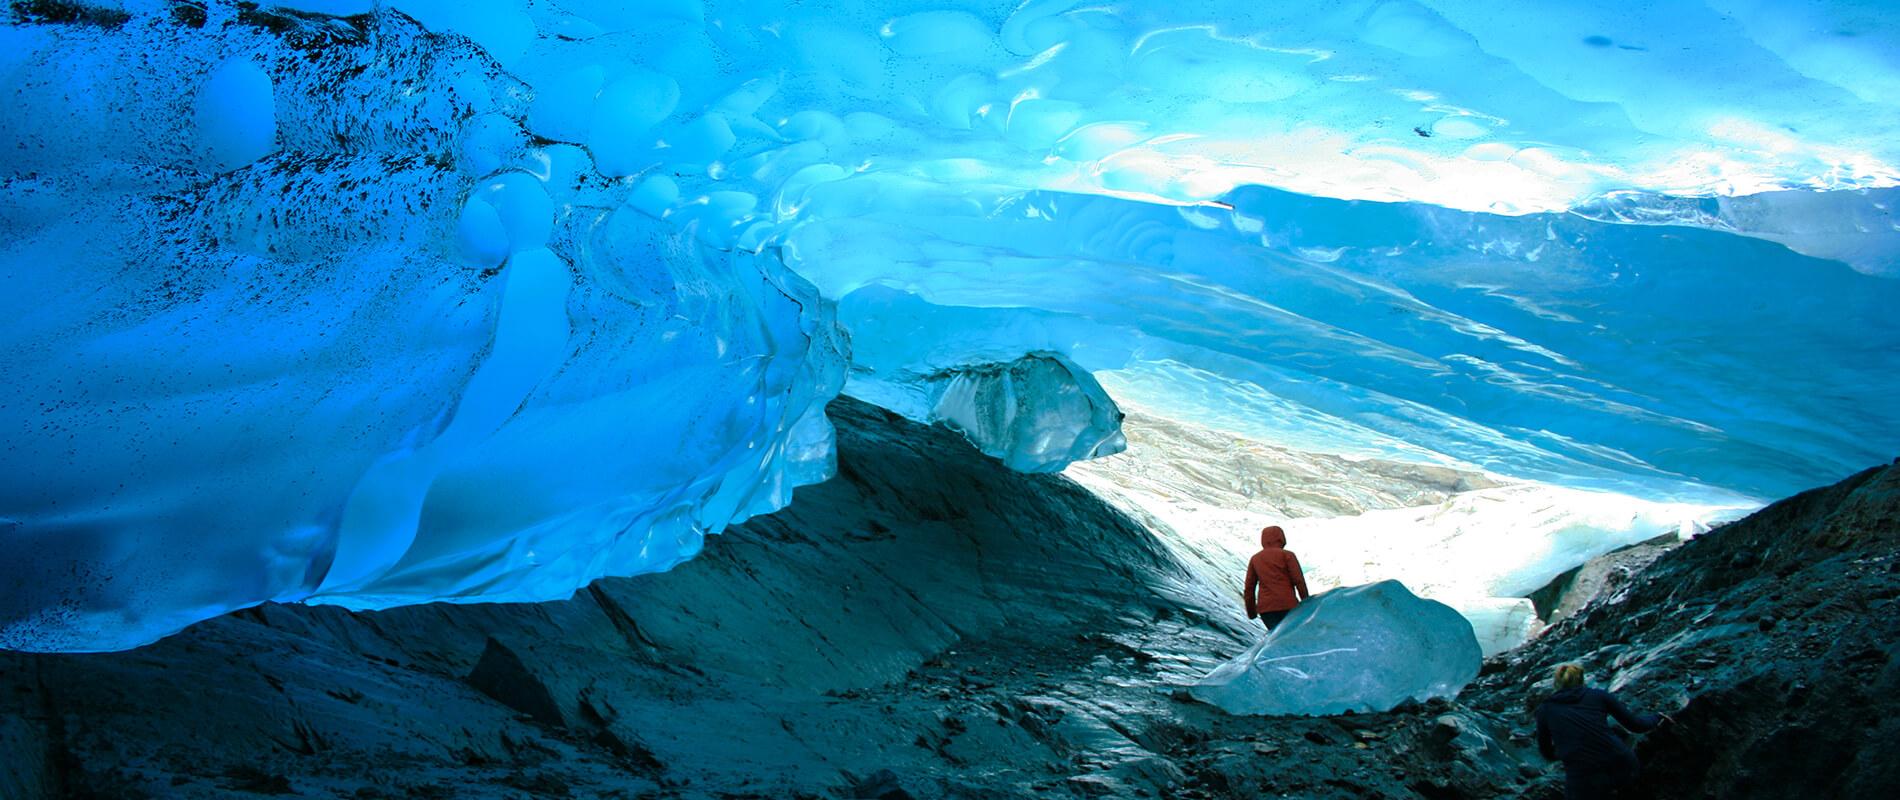 Mendenhall, an Alaskan Ice Cave